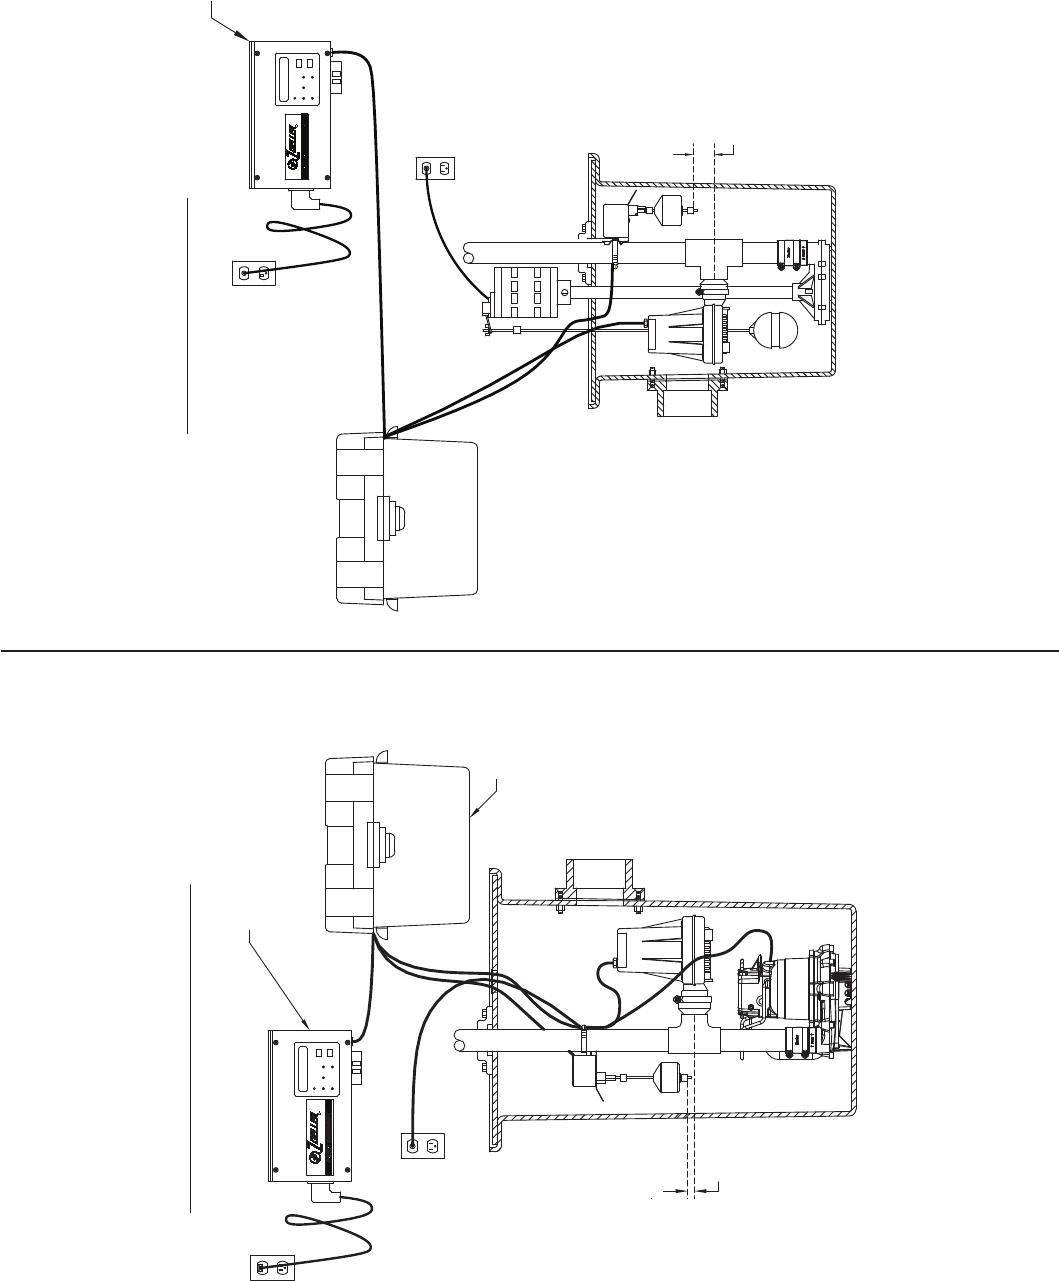 536908 2 Zoeller Aquanot 508 Installation Manual User